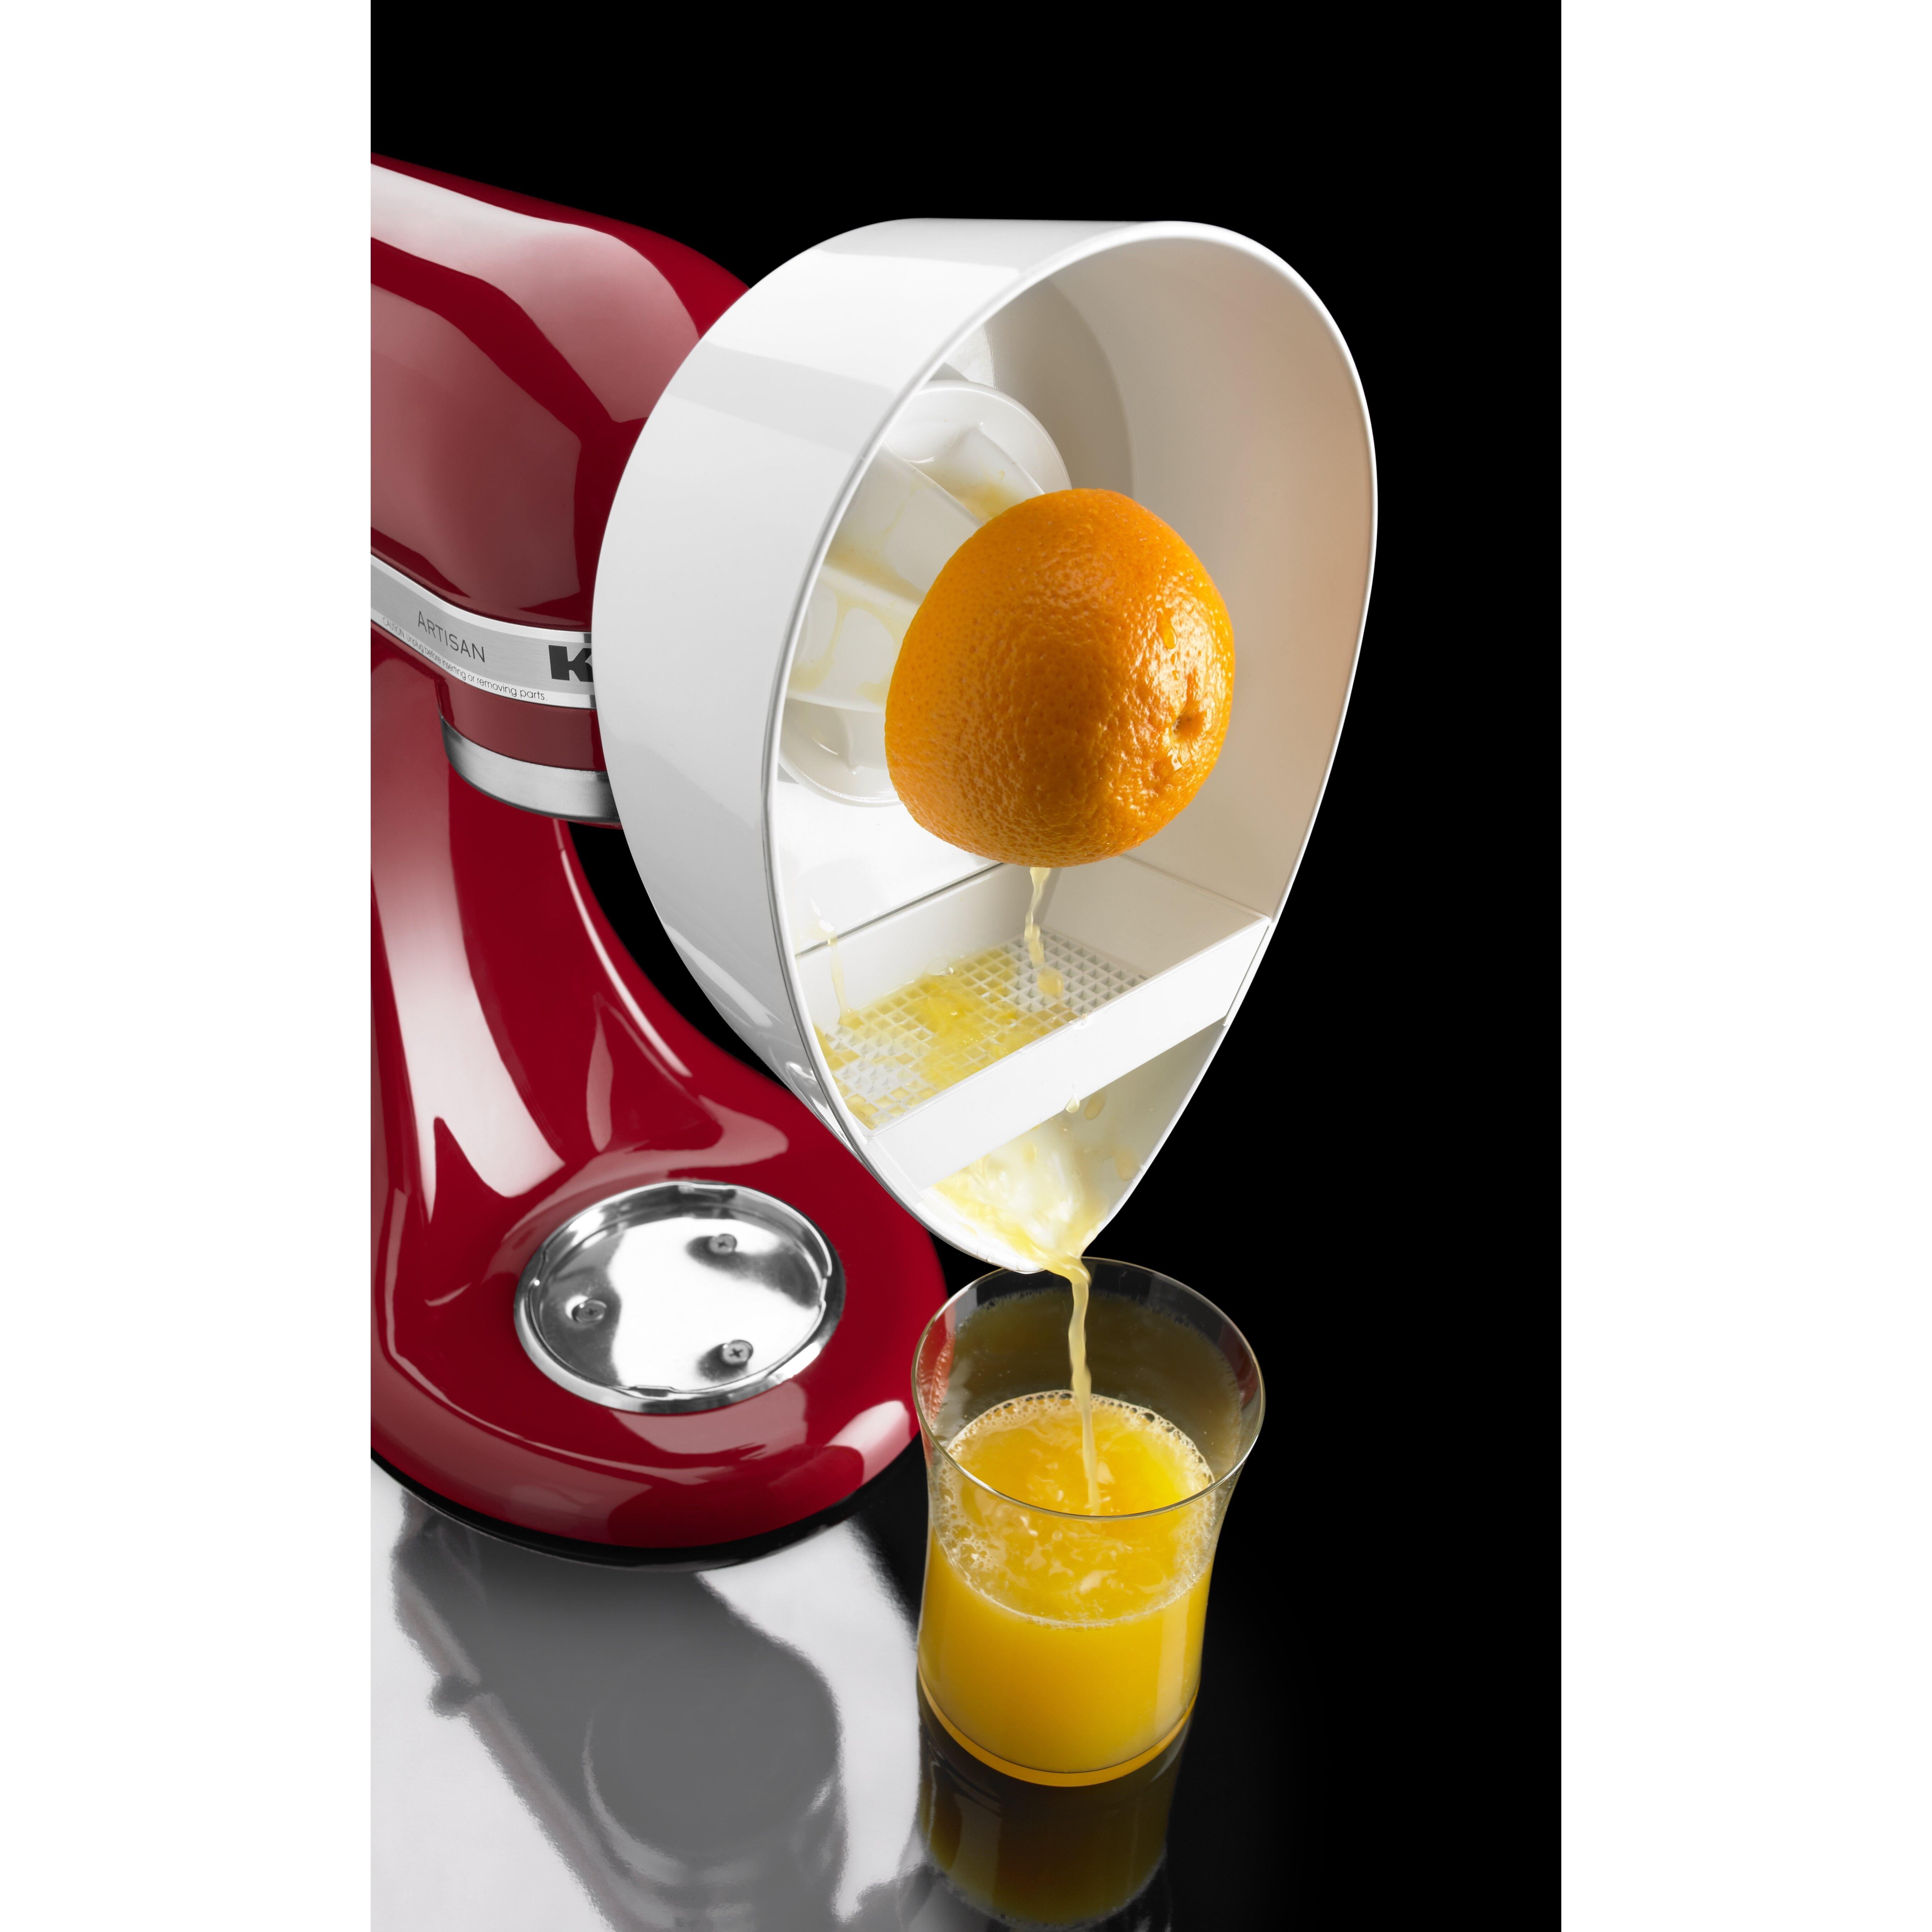 Amazon.com: Customer reviews: KitchenAid JE Citrus Juicer ...